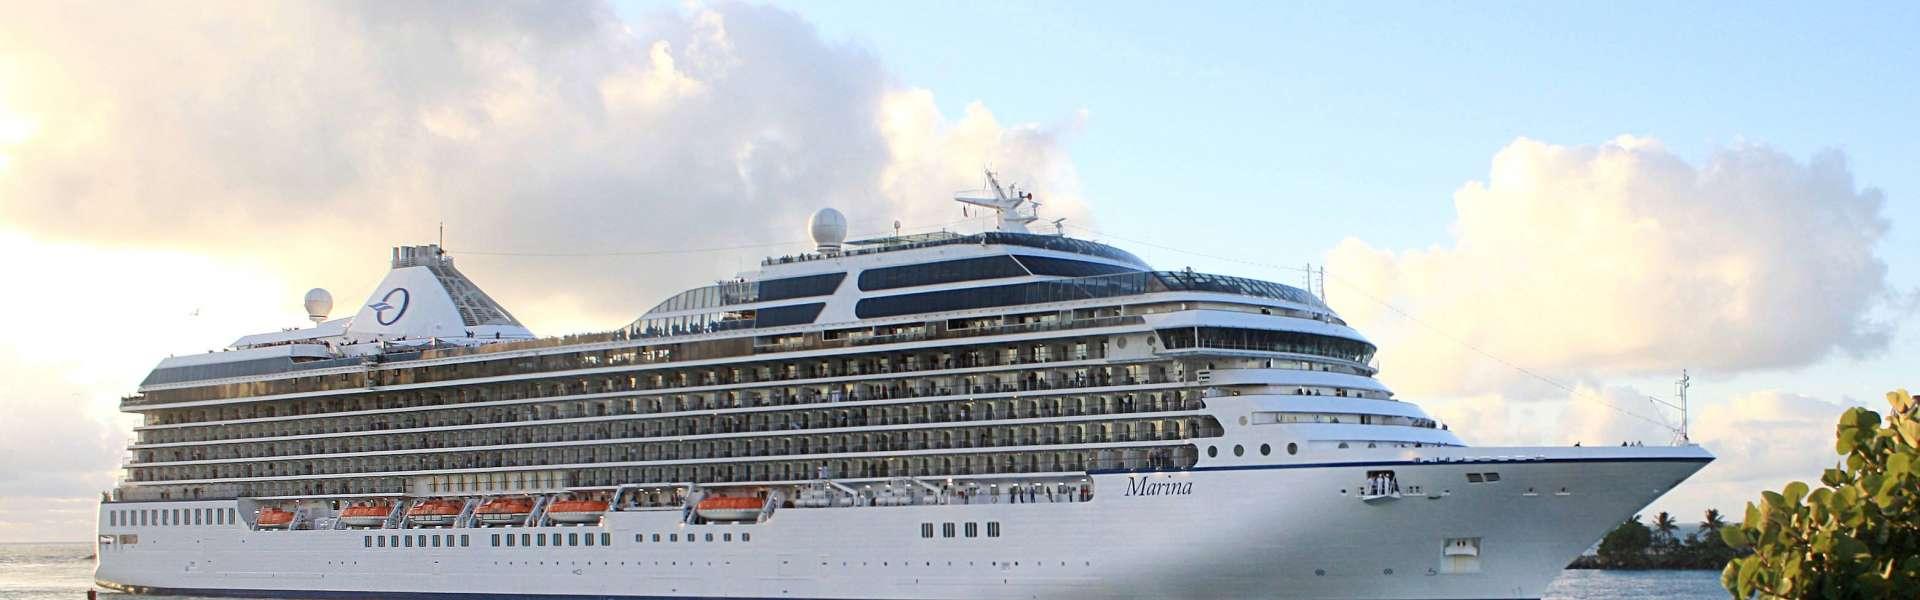 Croaziera 2019 - Baltice/Rusia (Stockholm) - Oceania Cruises - Marina - 7 nopti